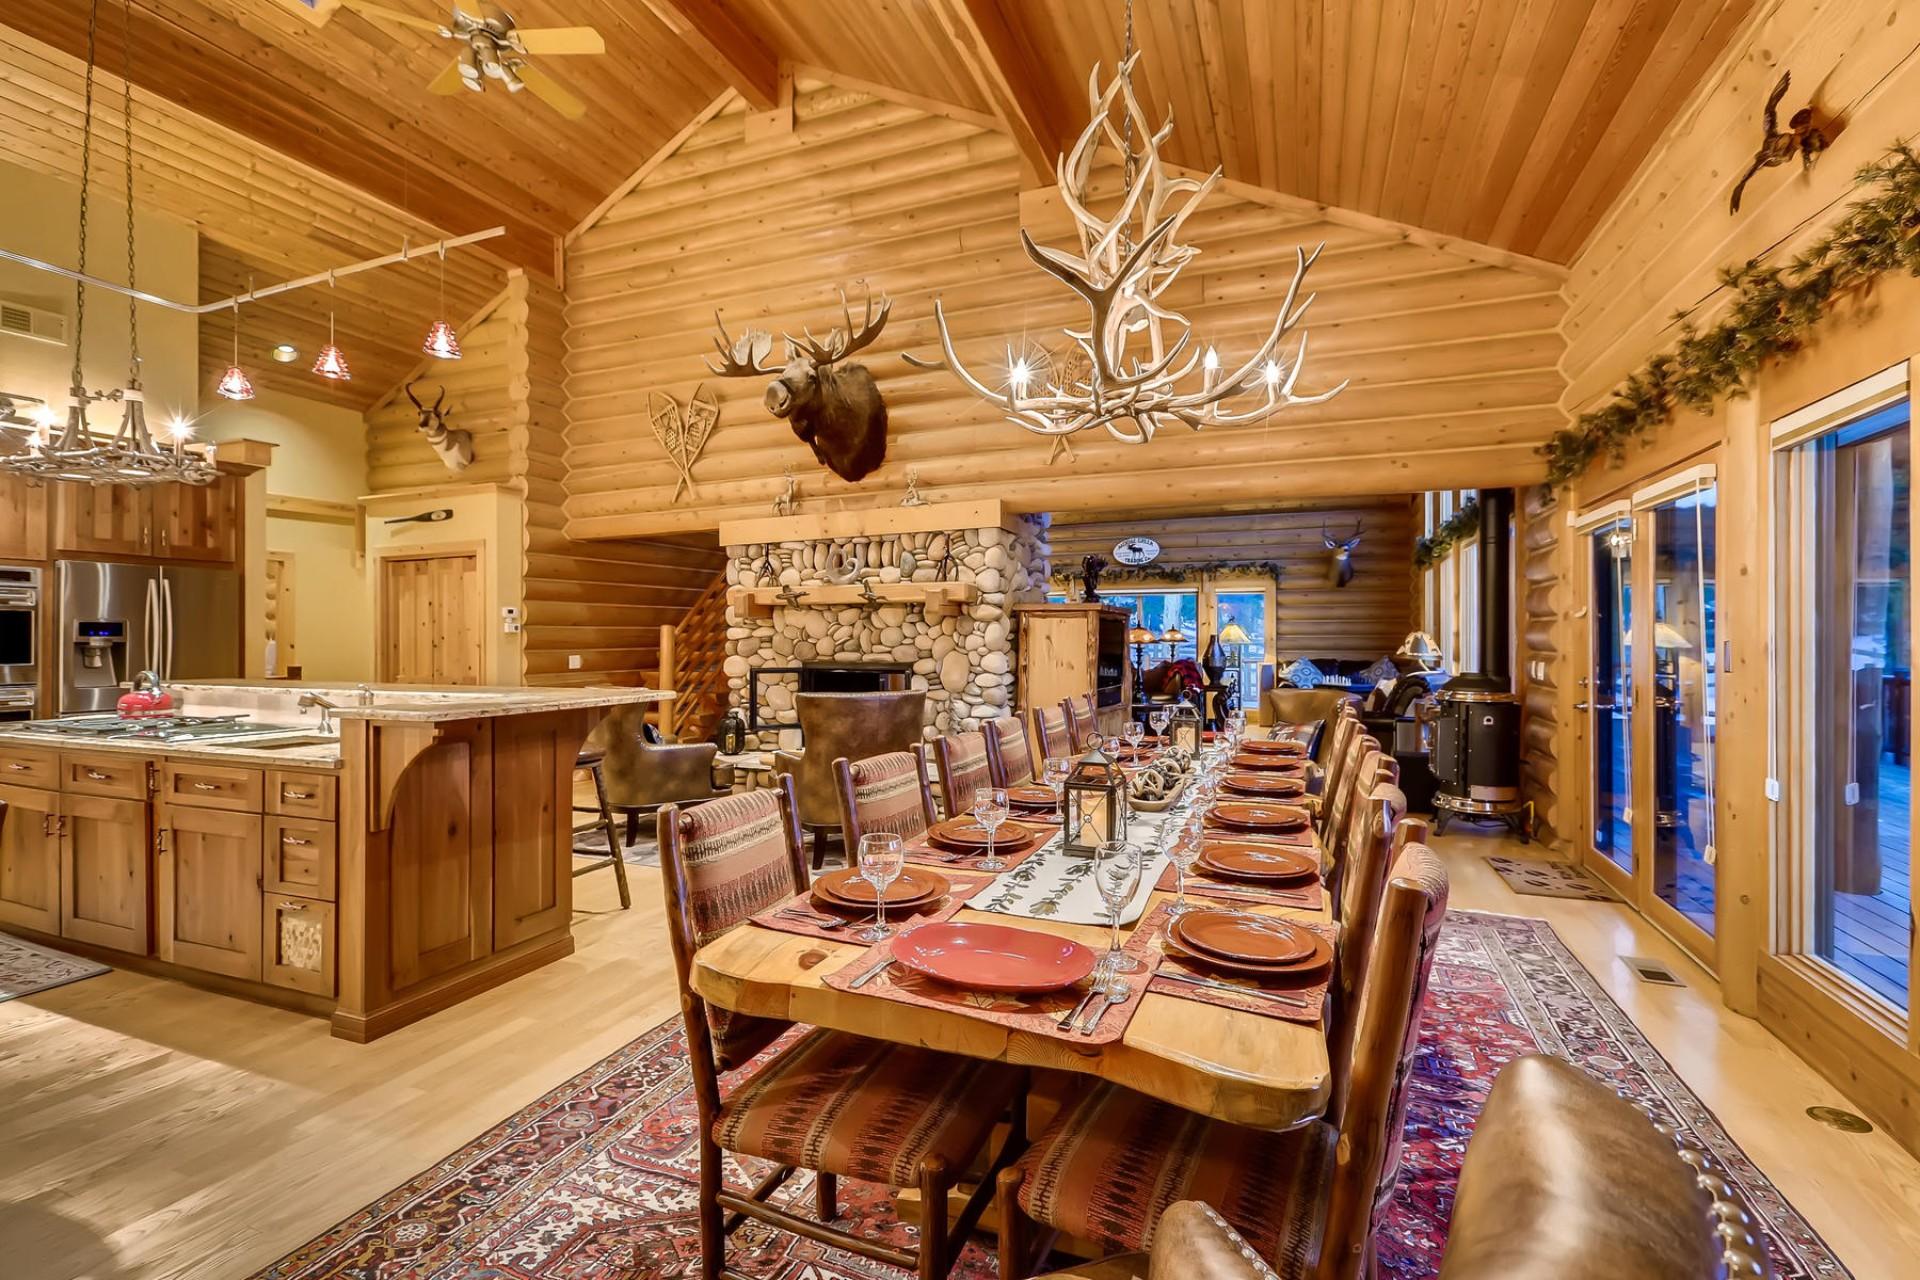 River Ranch Lodge | River Ridge Rentals on ranch brick house plans, ranch kitchen house plans, ranch log cabin plans, ranch cottage plans, ranch deck house plans, ranch double house plans,